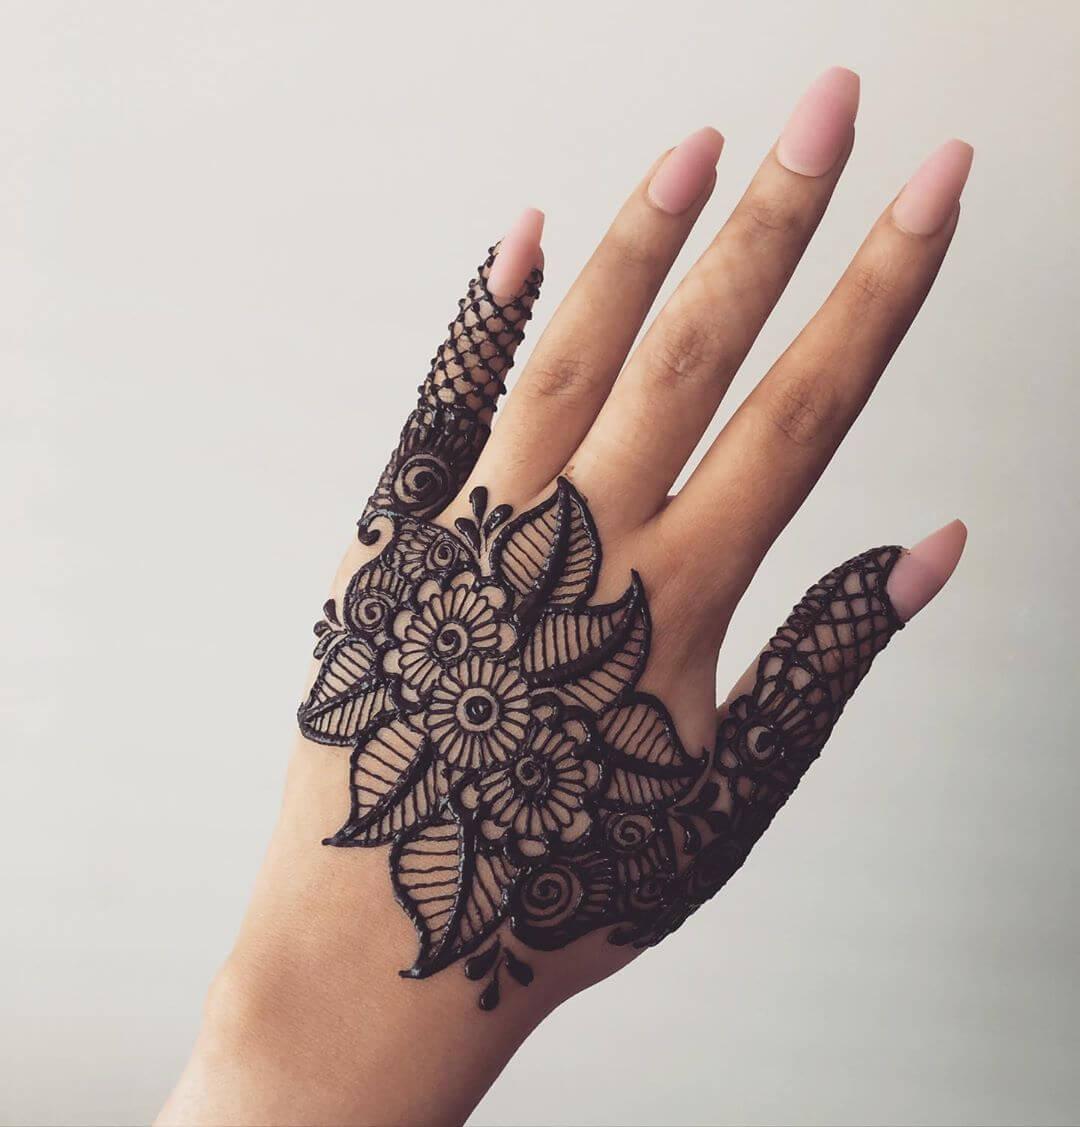 Partial Handcuff Design Beautiful Jewellery Mehndi Designs for Back Hand